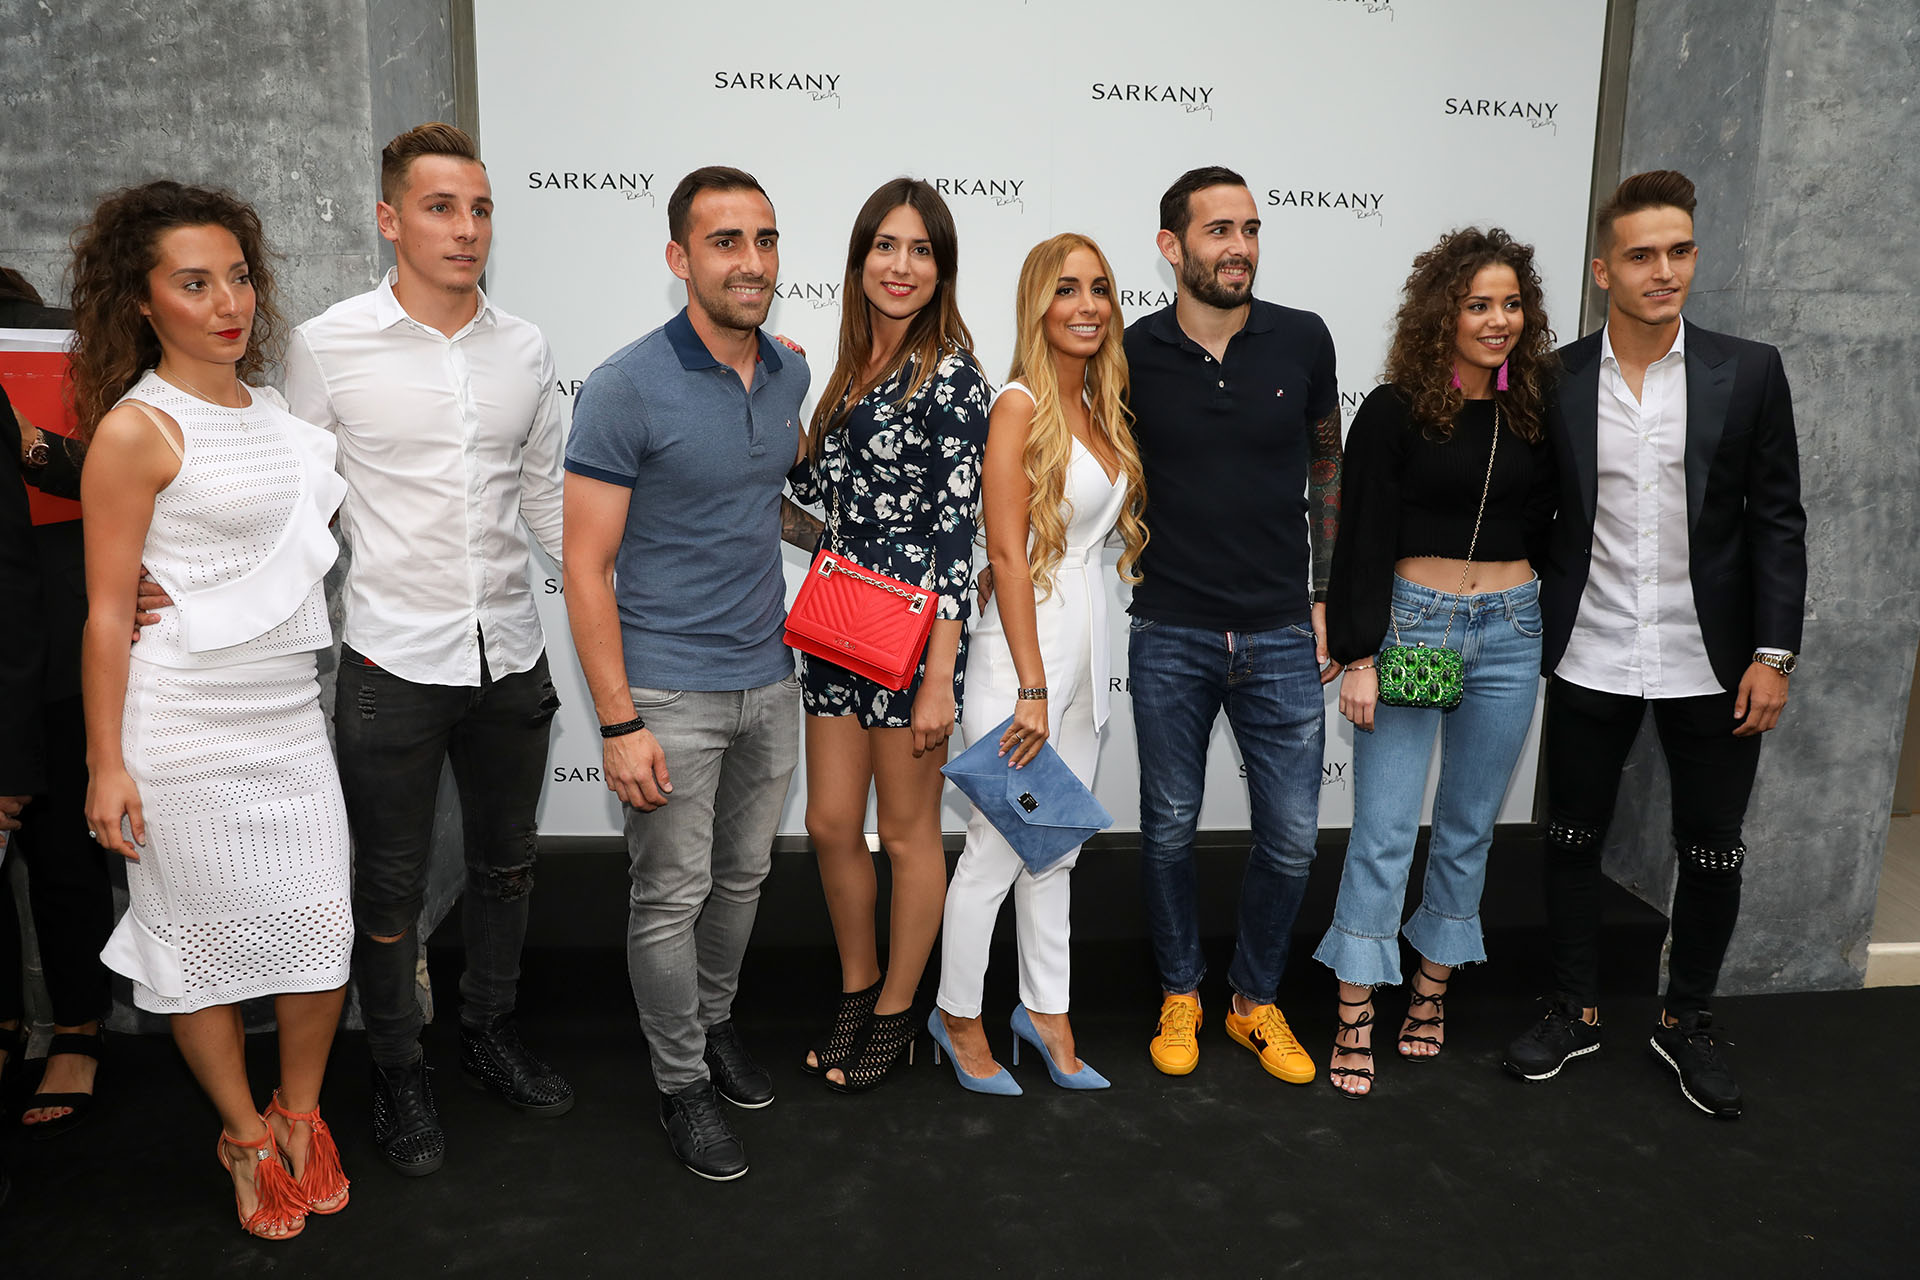 Lucas Digne, Paco Alcácer, Aleix Vidal y Denis Suárez junto a sus parejas